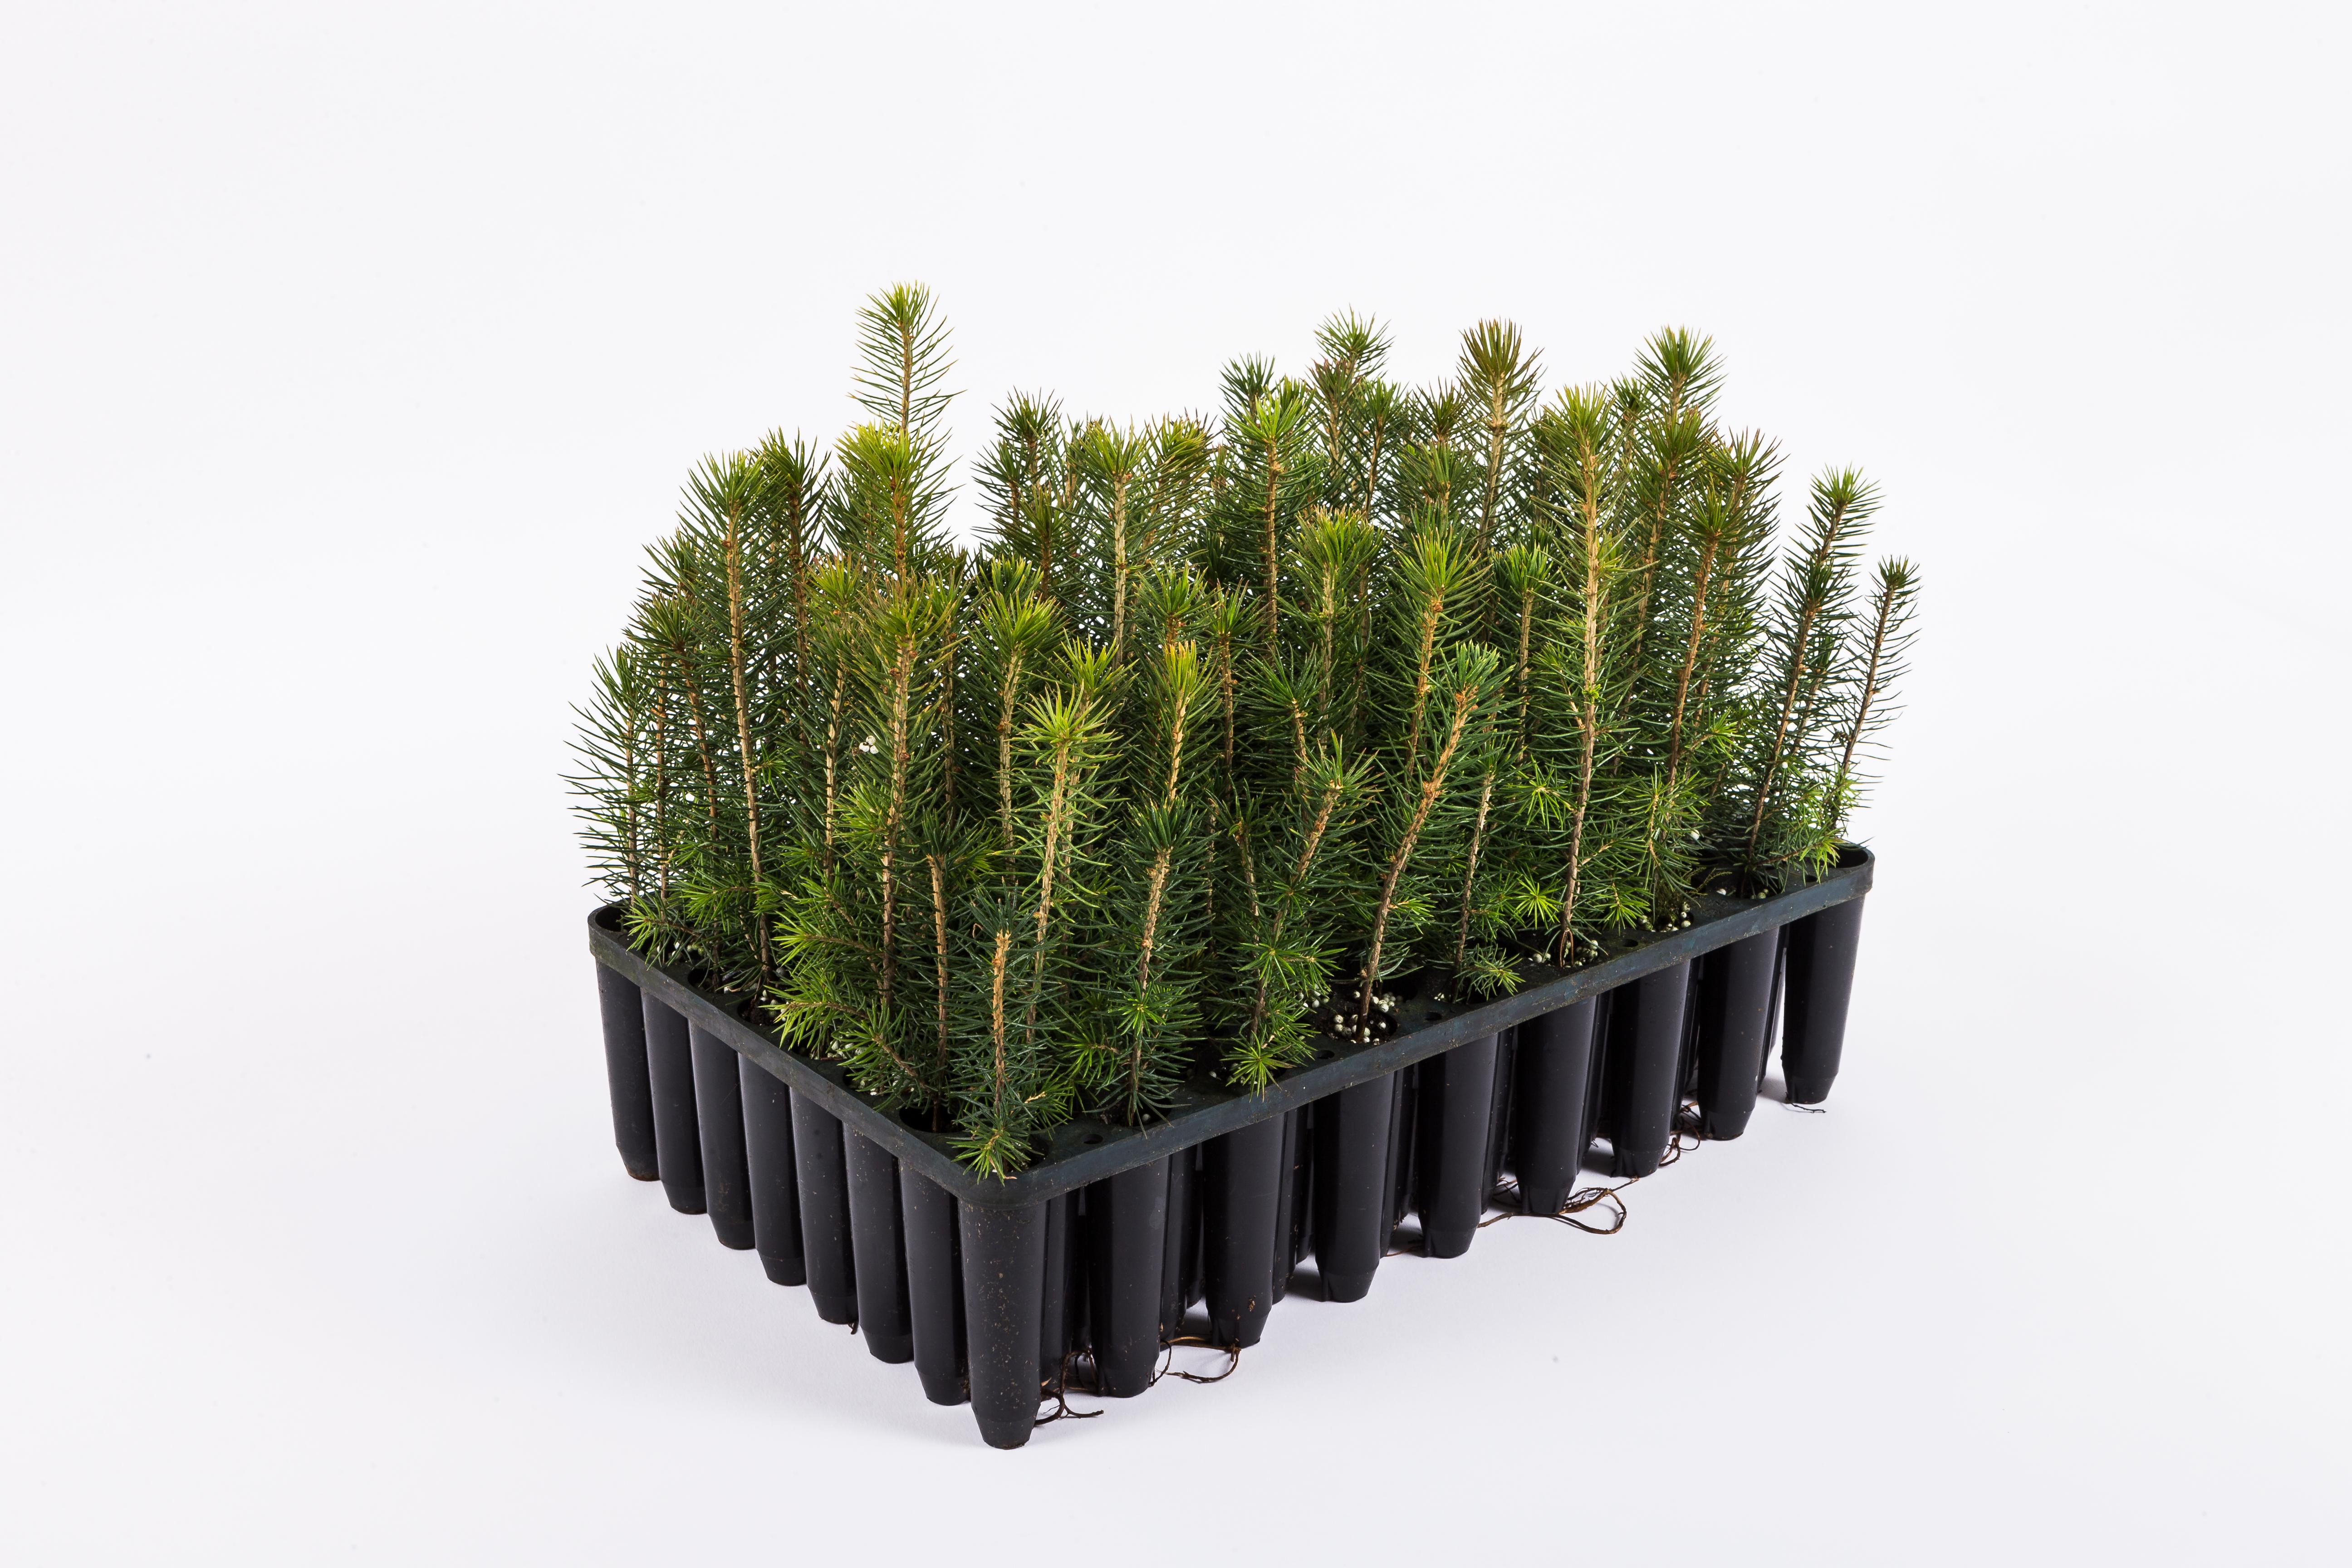 Plantlåda granplantor PowerPot  NorrPlantPowerPot spruce seedlings  NorrPlant